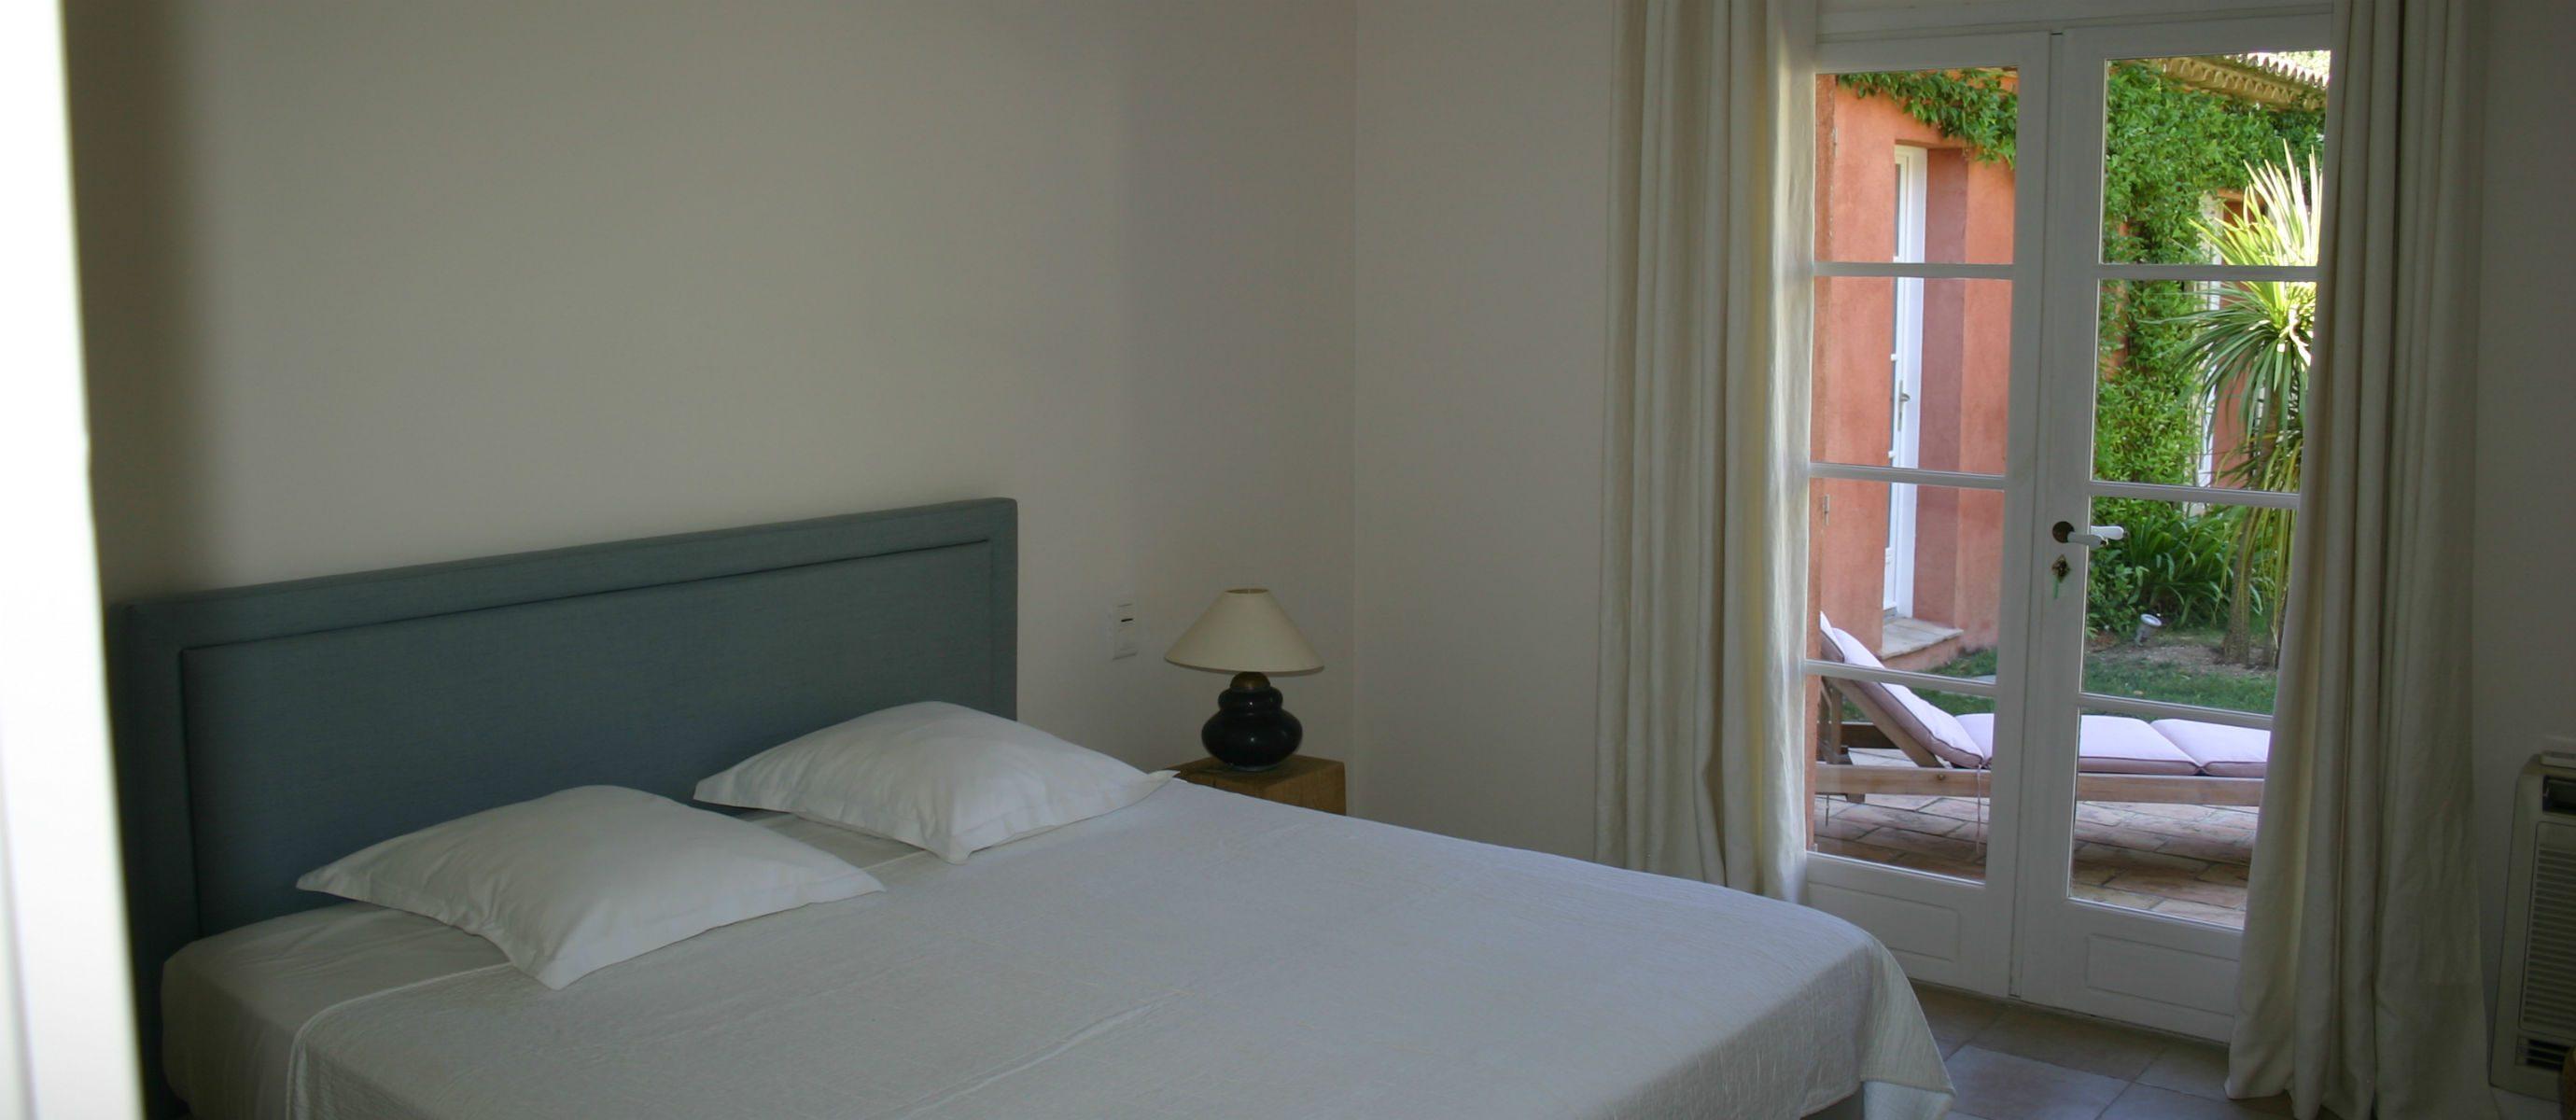 MR. Bedroom. IMG_2360